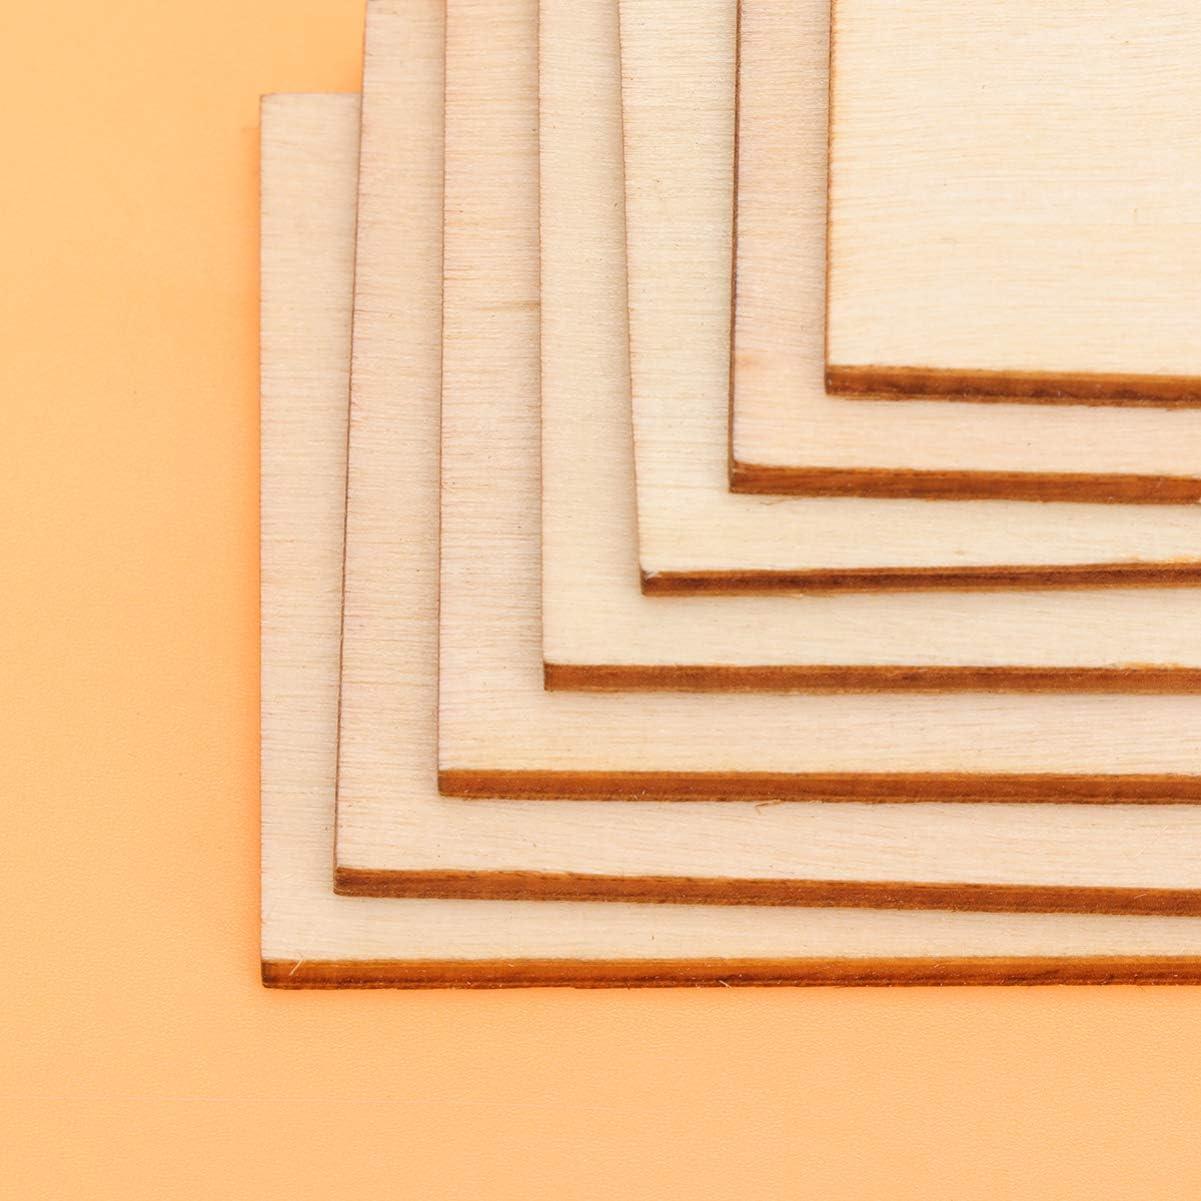 Healifty piezas de madera sin terminar placas de madera rectangulares signos discos de madera sin terminar recortes de madera para adornos manualidades bricolaje 36 piezas 12.7x12.7cm